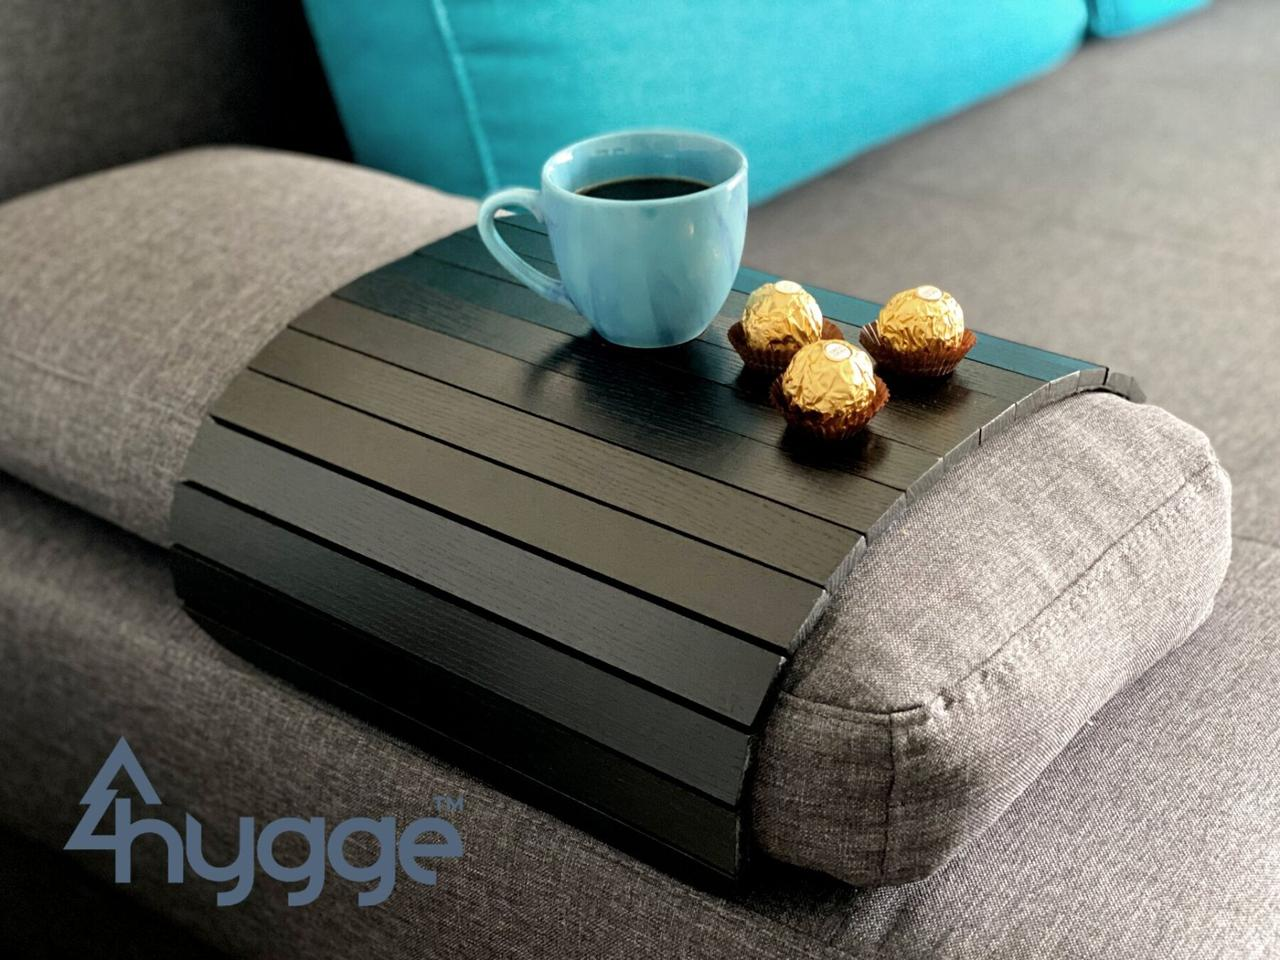 Деревянный столик-накладка на диван для завтрака норвежский бренд Hygge™ черный деревянные столики-коврики